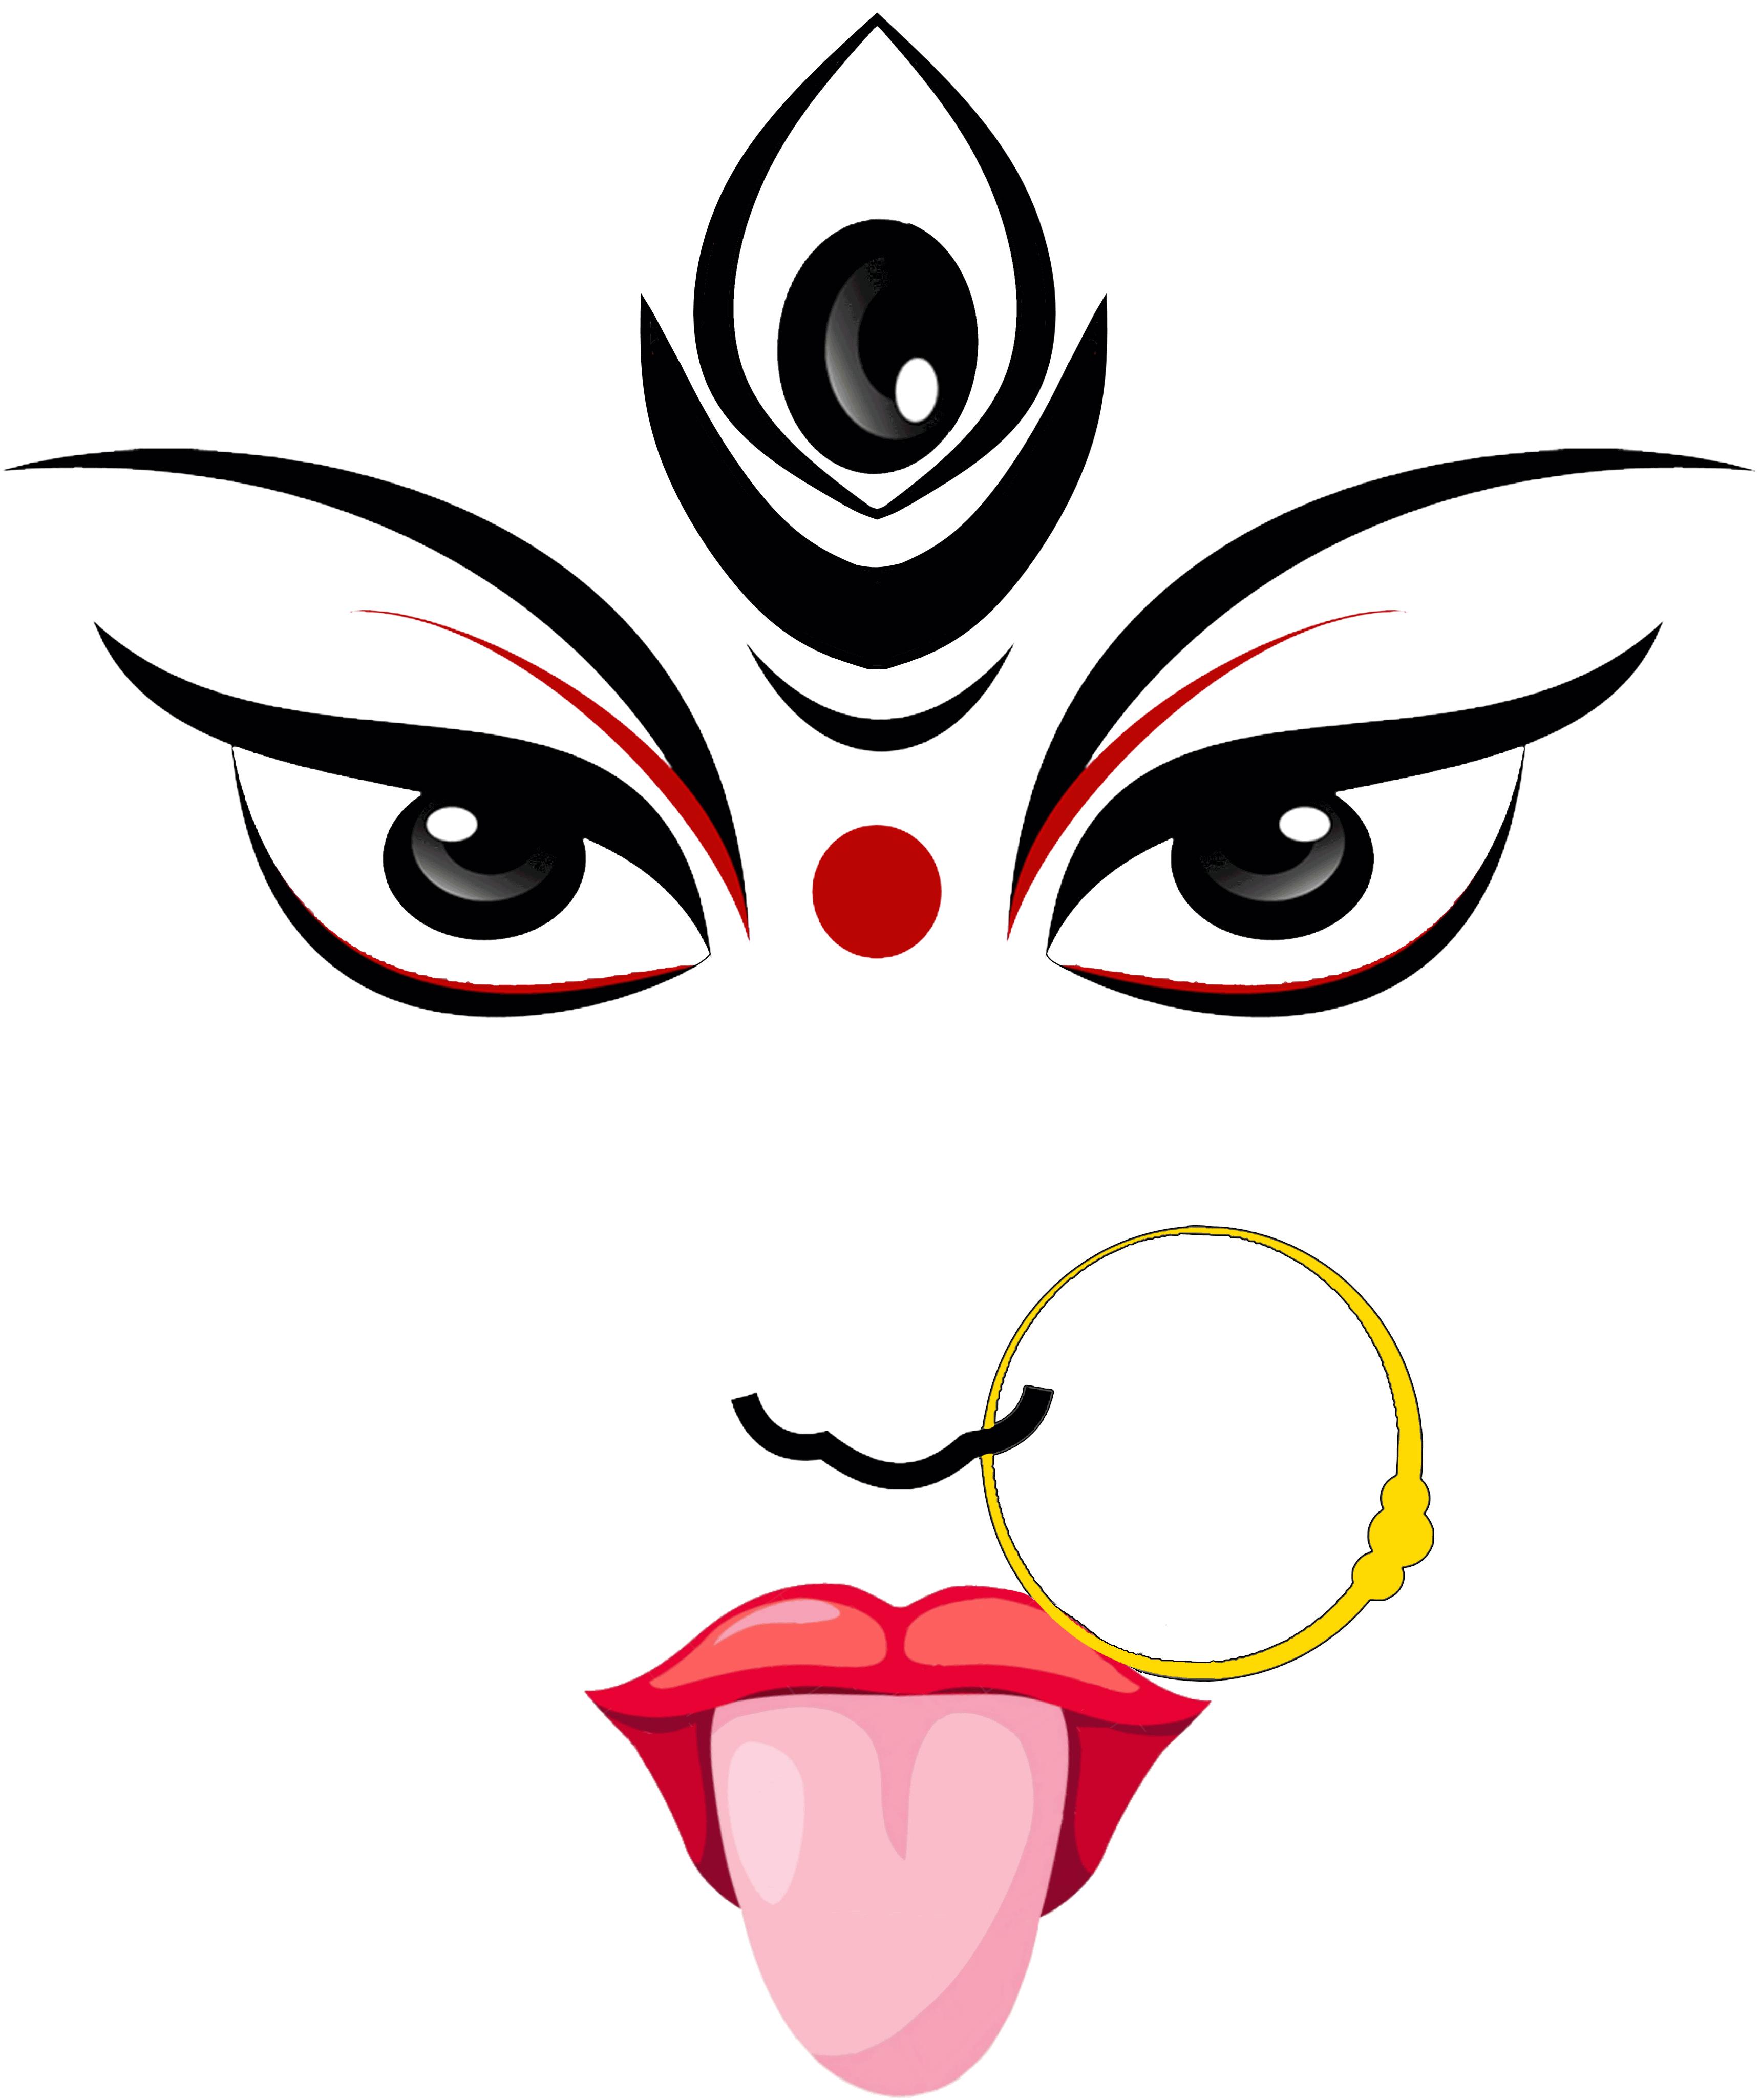 Maa Kali Images PNG - 61674